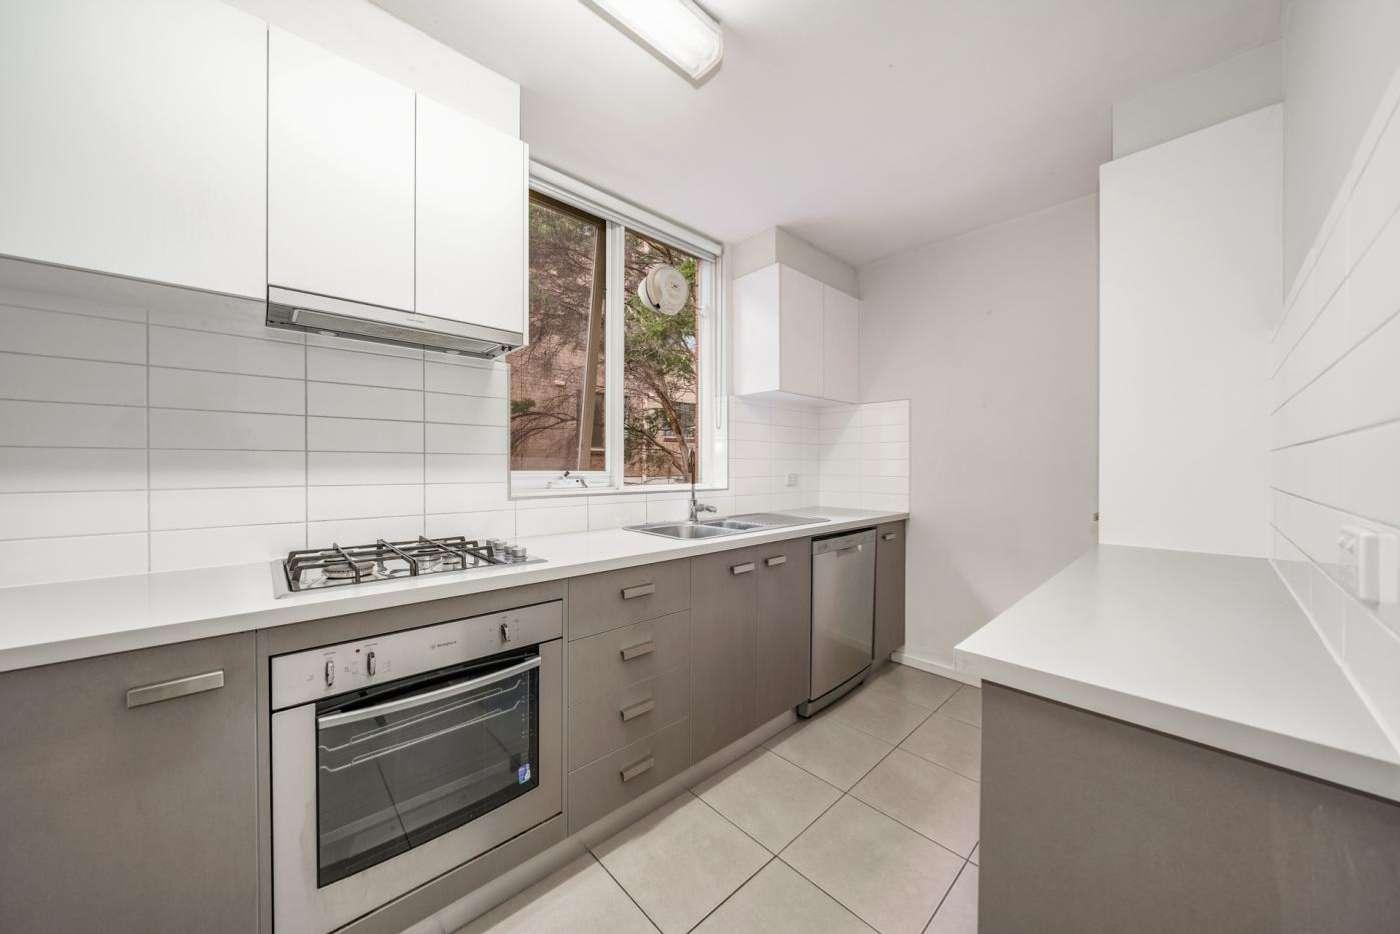 Main view of Homely apartment listing, 2/17 Redan Street, St Kilda VIC 3182